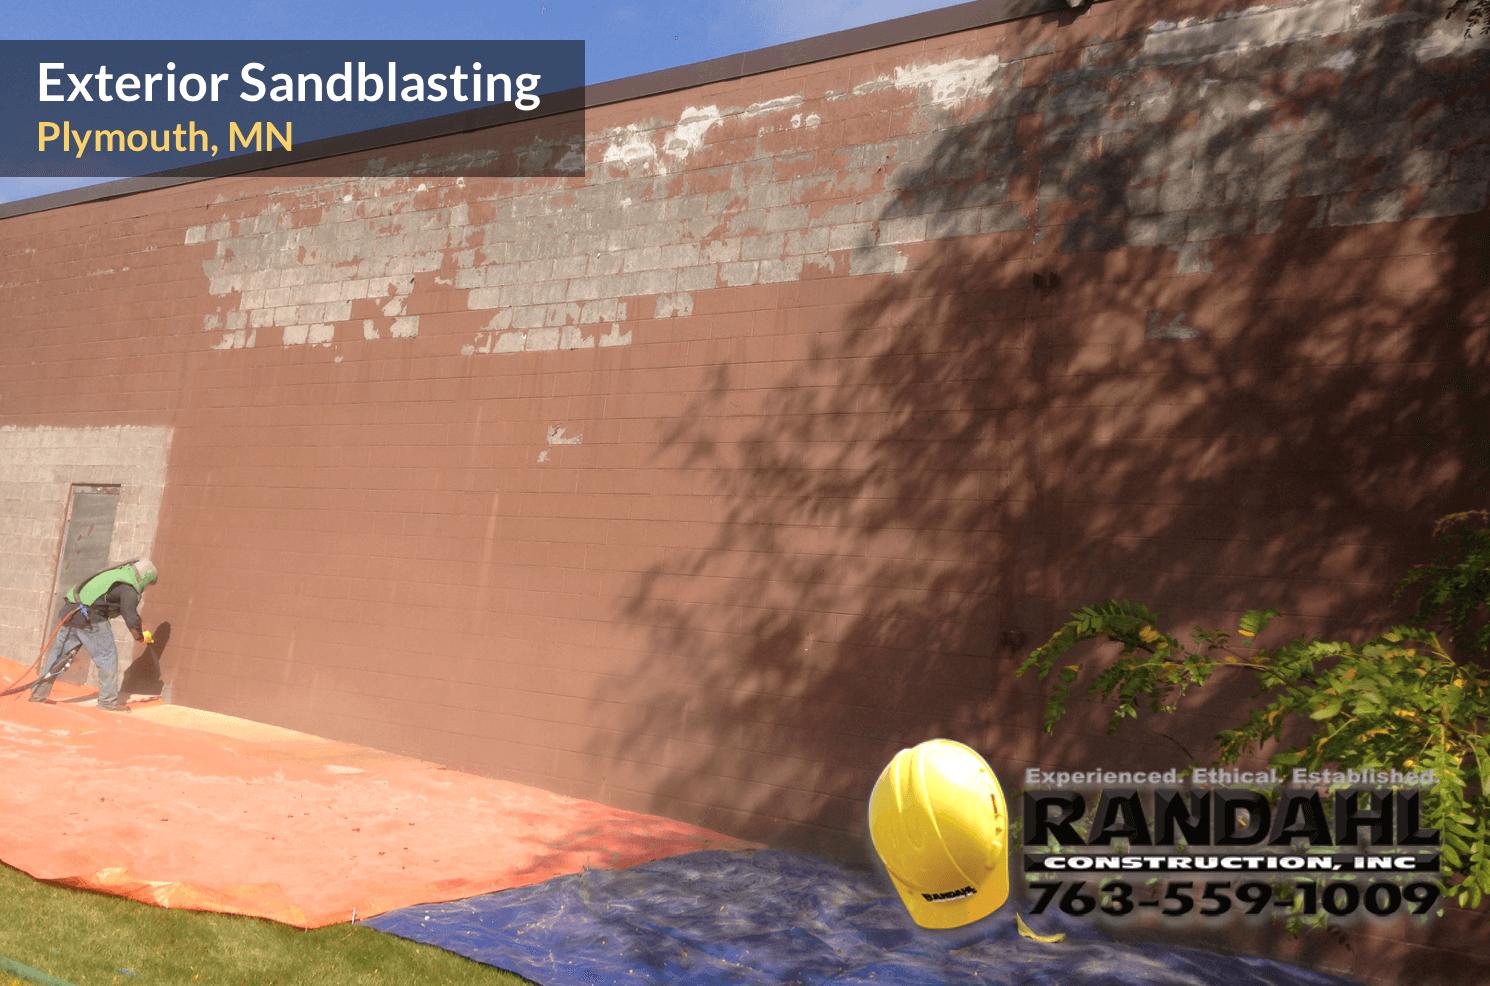 minnesota building sandblasting